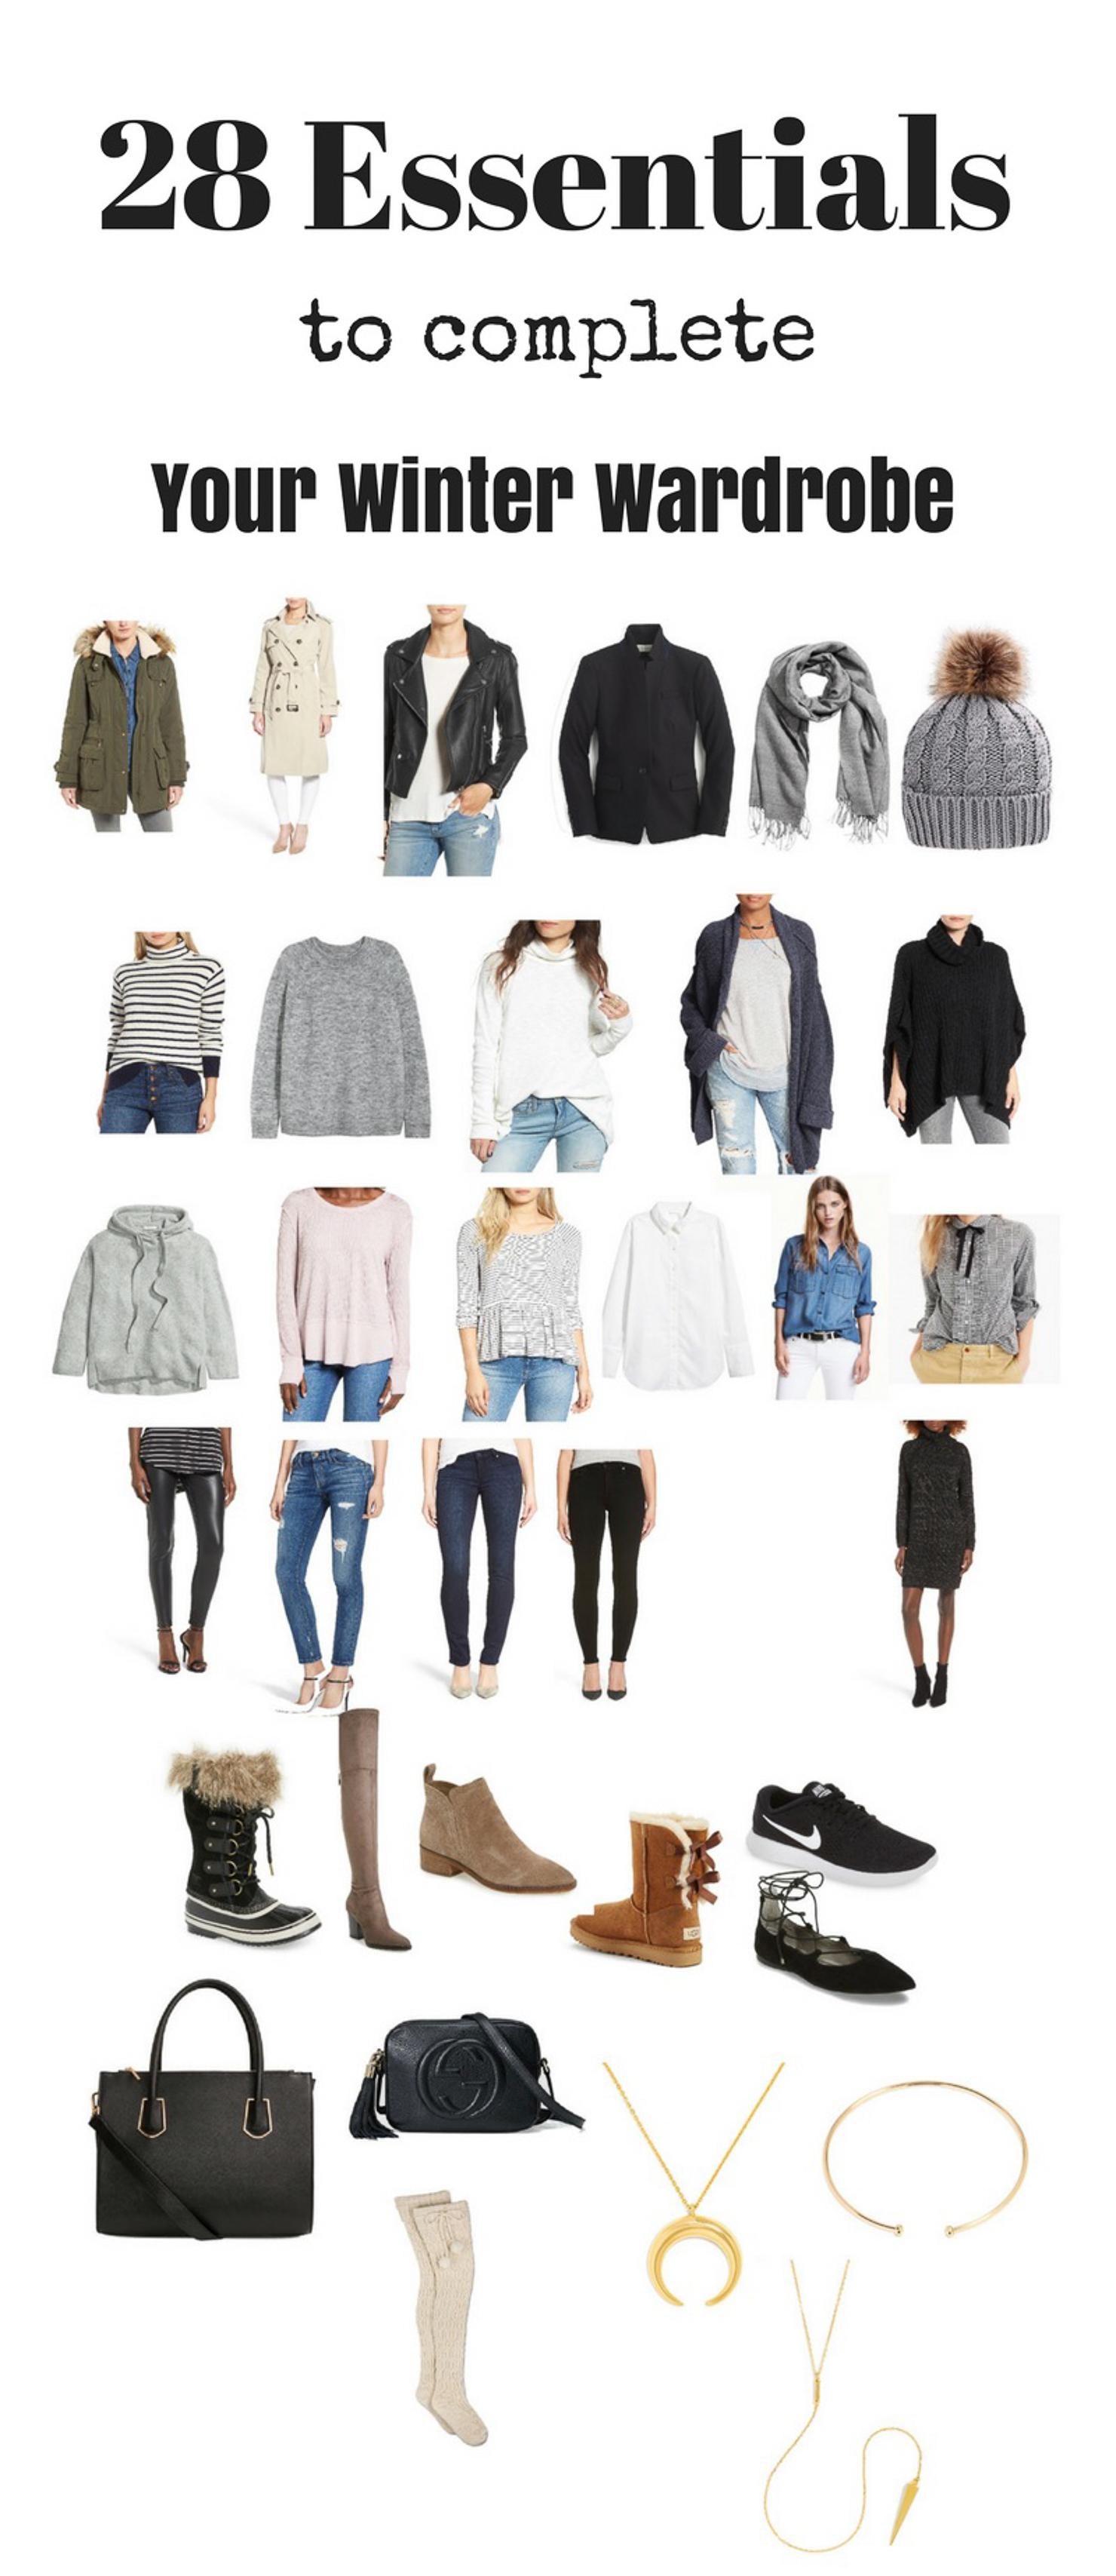 28-essentials-to-complete-your-winter-wardrobe